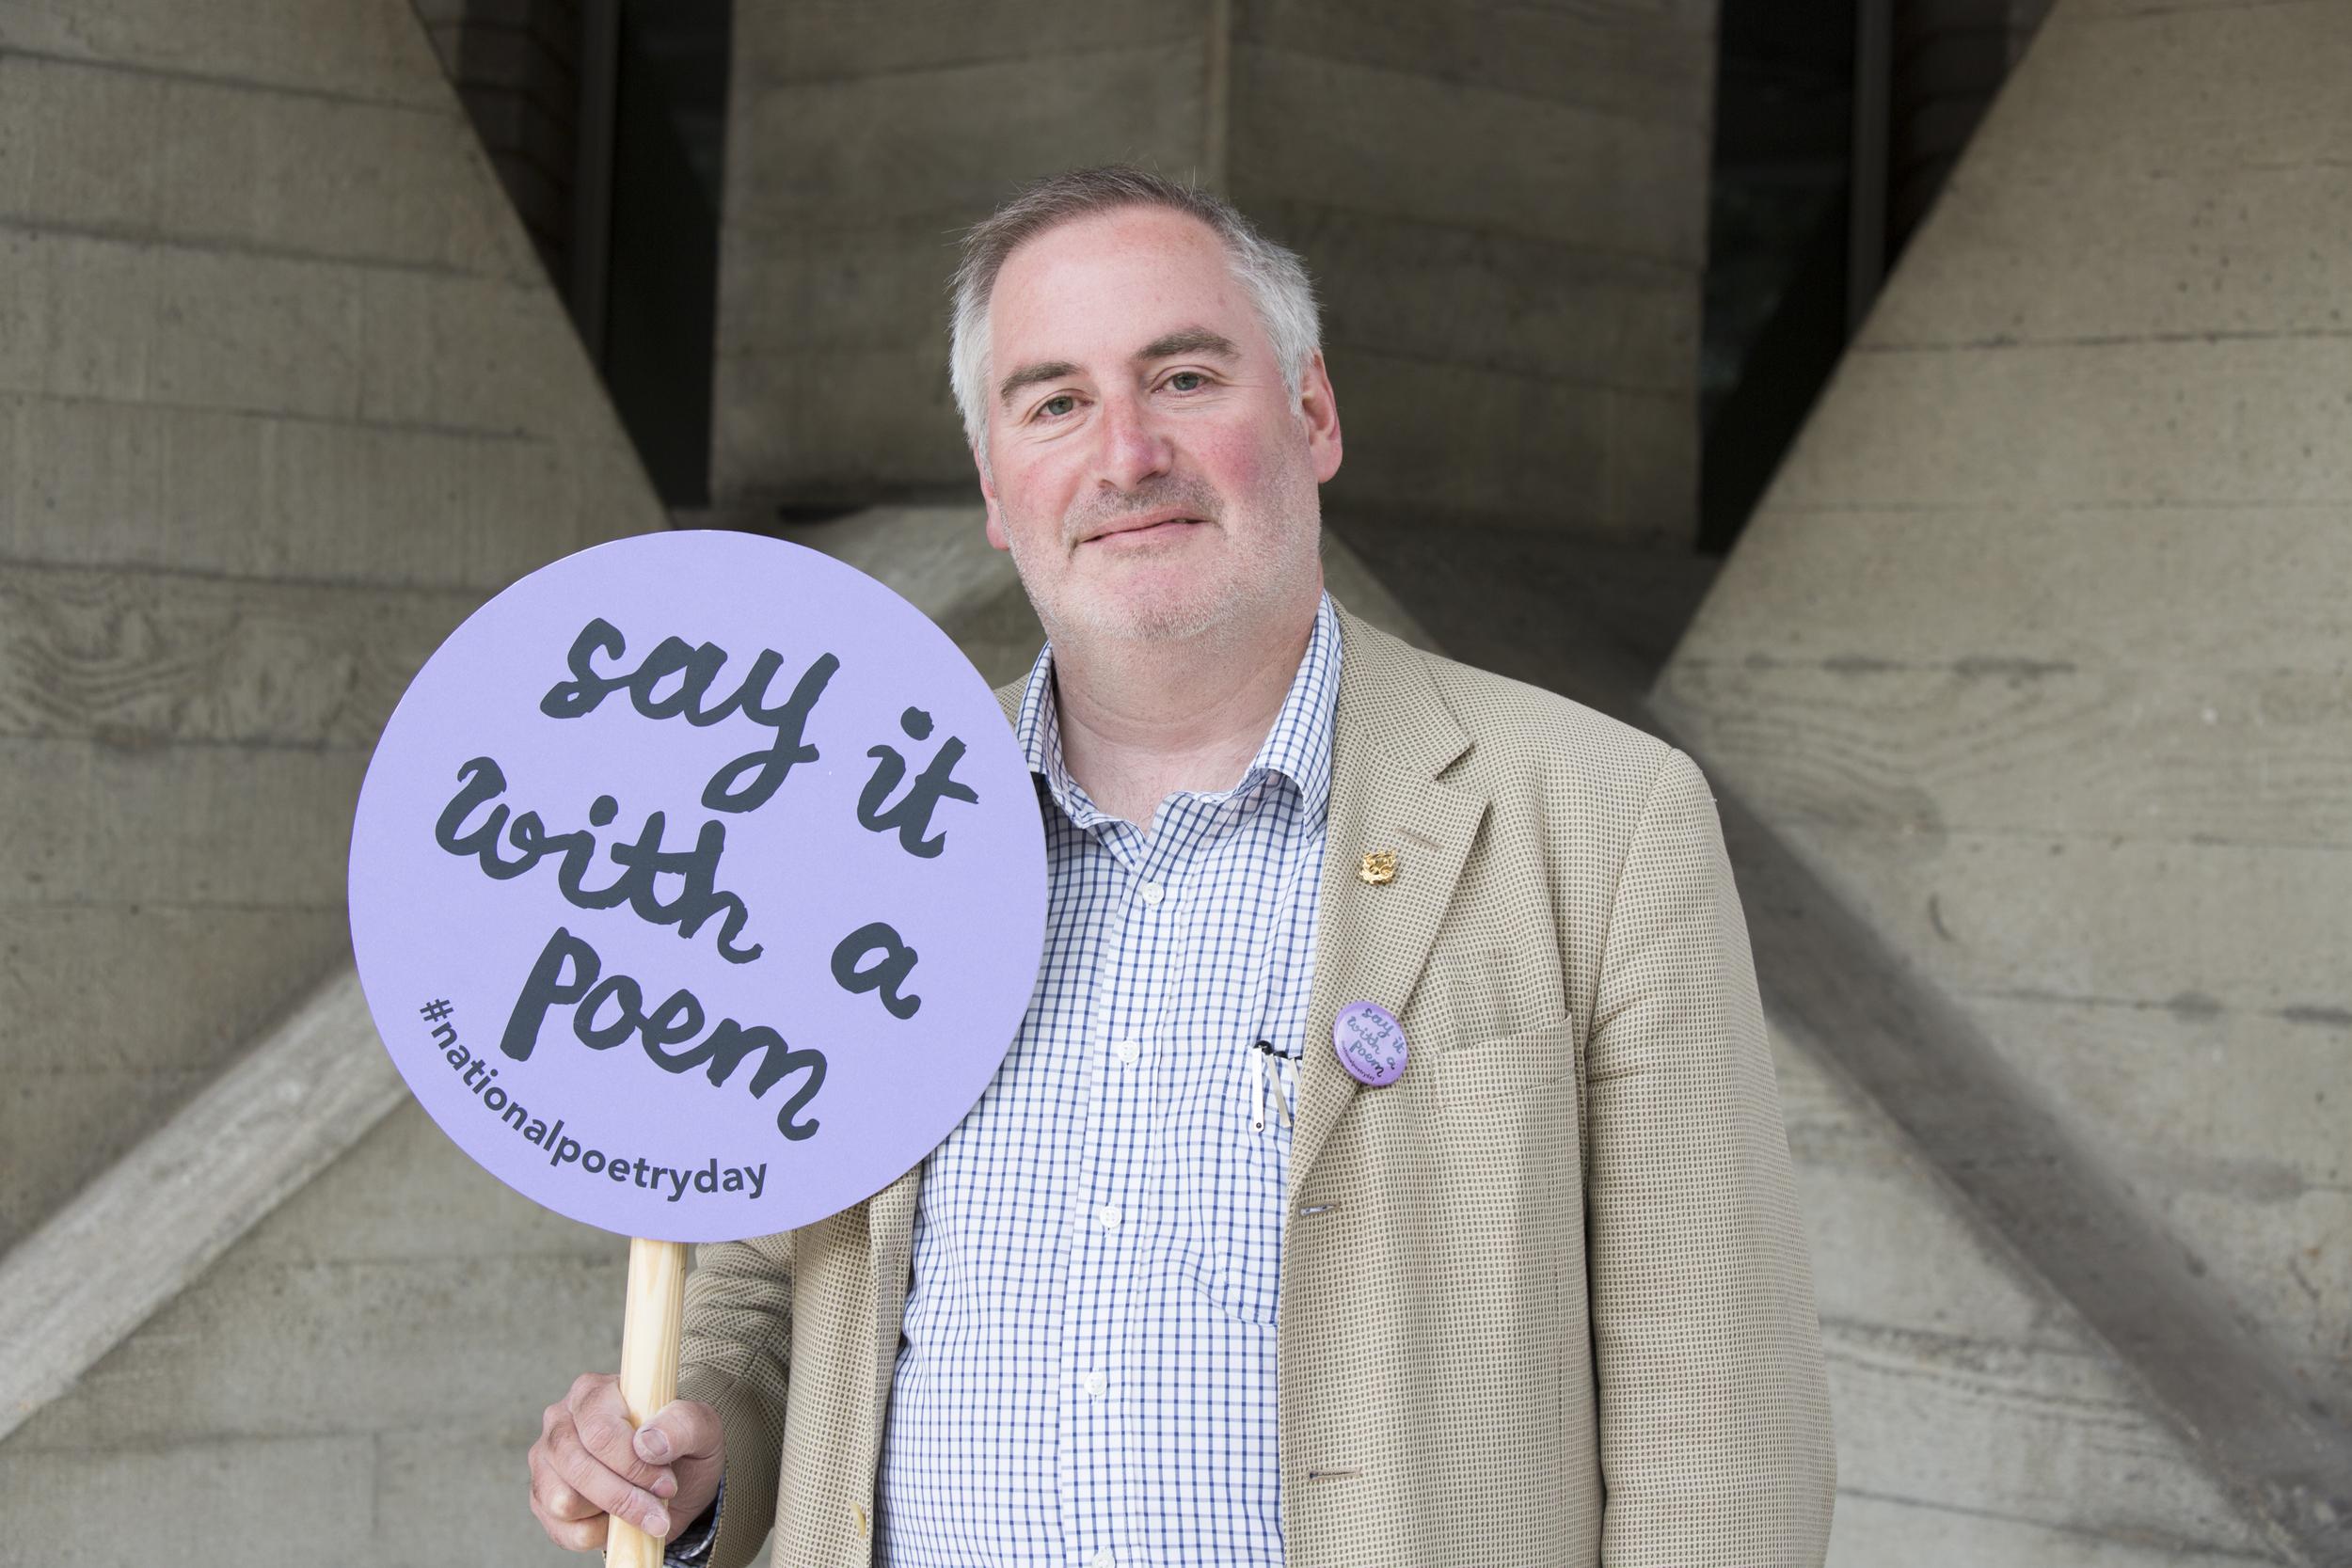 Chris Riddell - National Poetry Day - Credit Ellie Kurttz